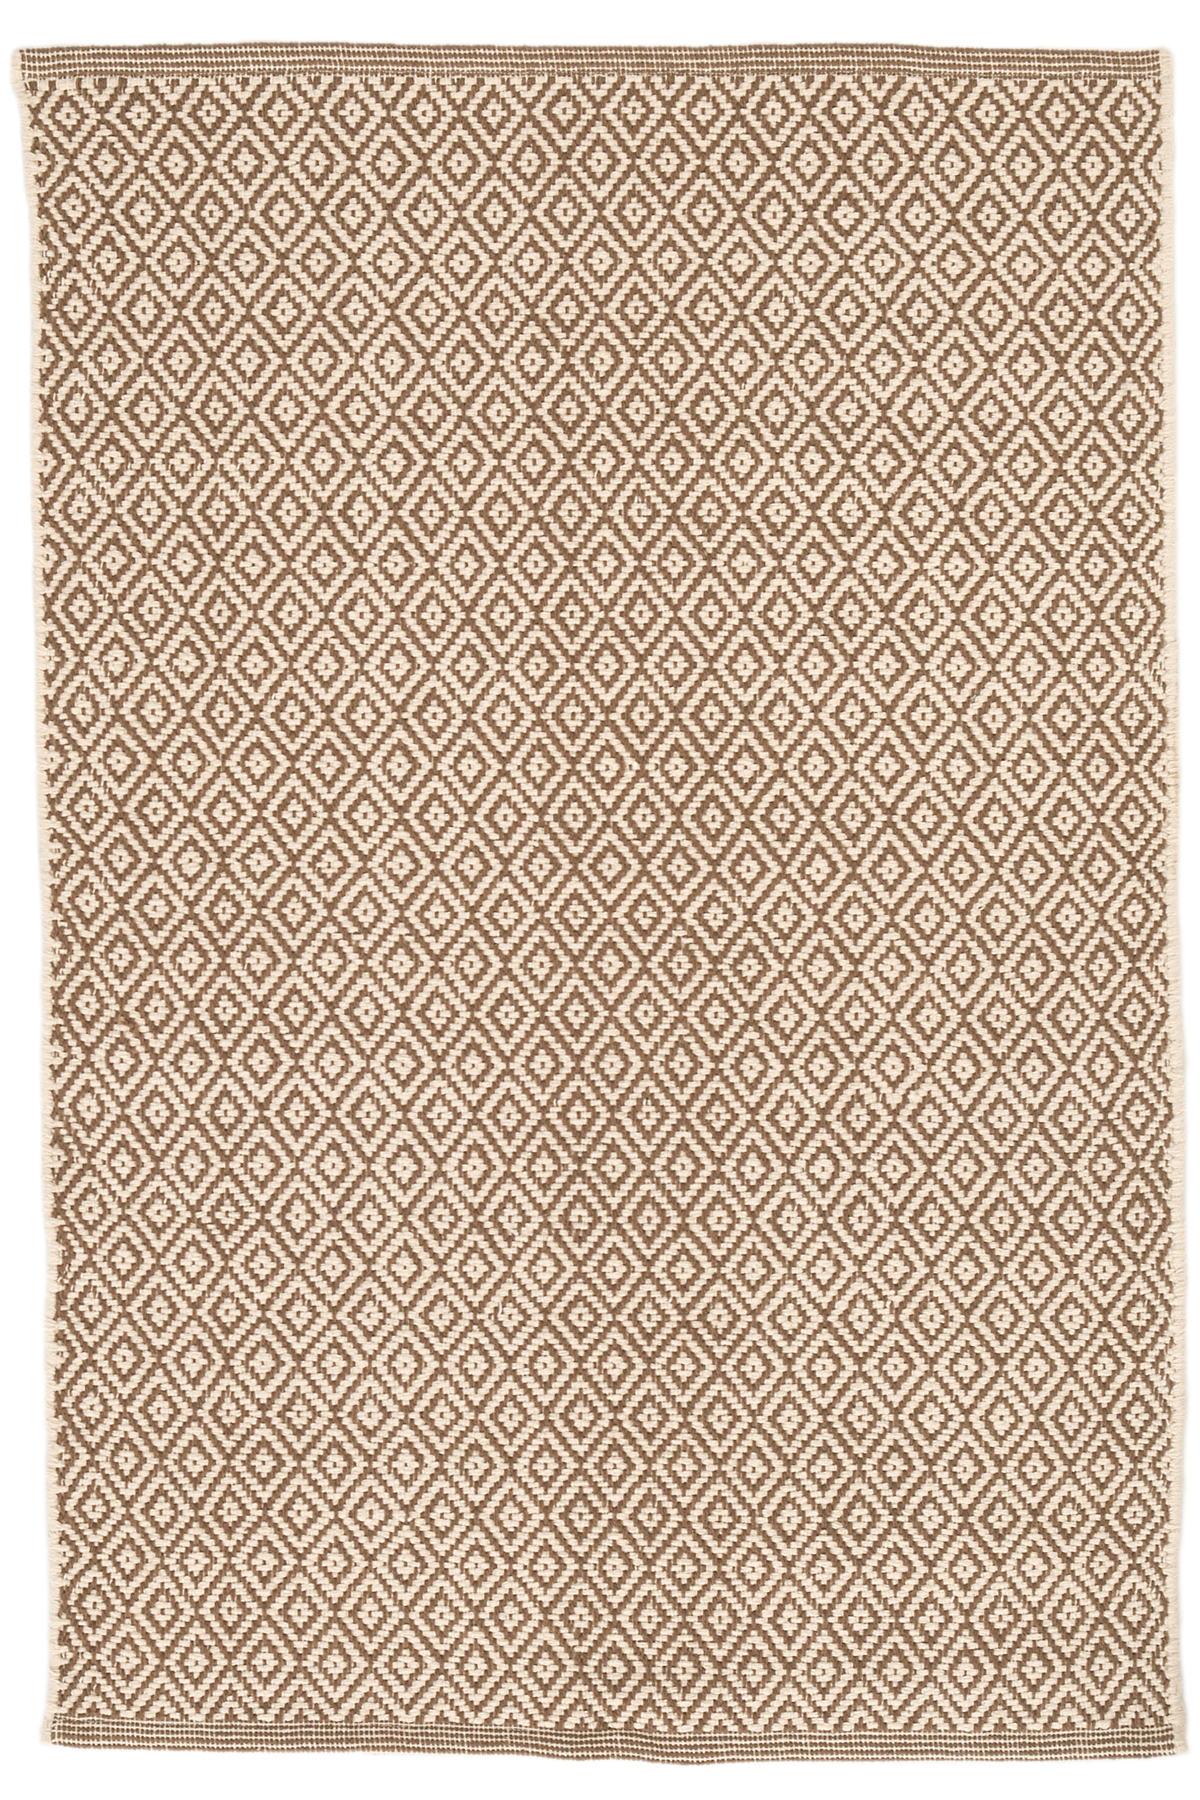 Lattice Stone Woven Cotton Rug